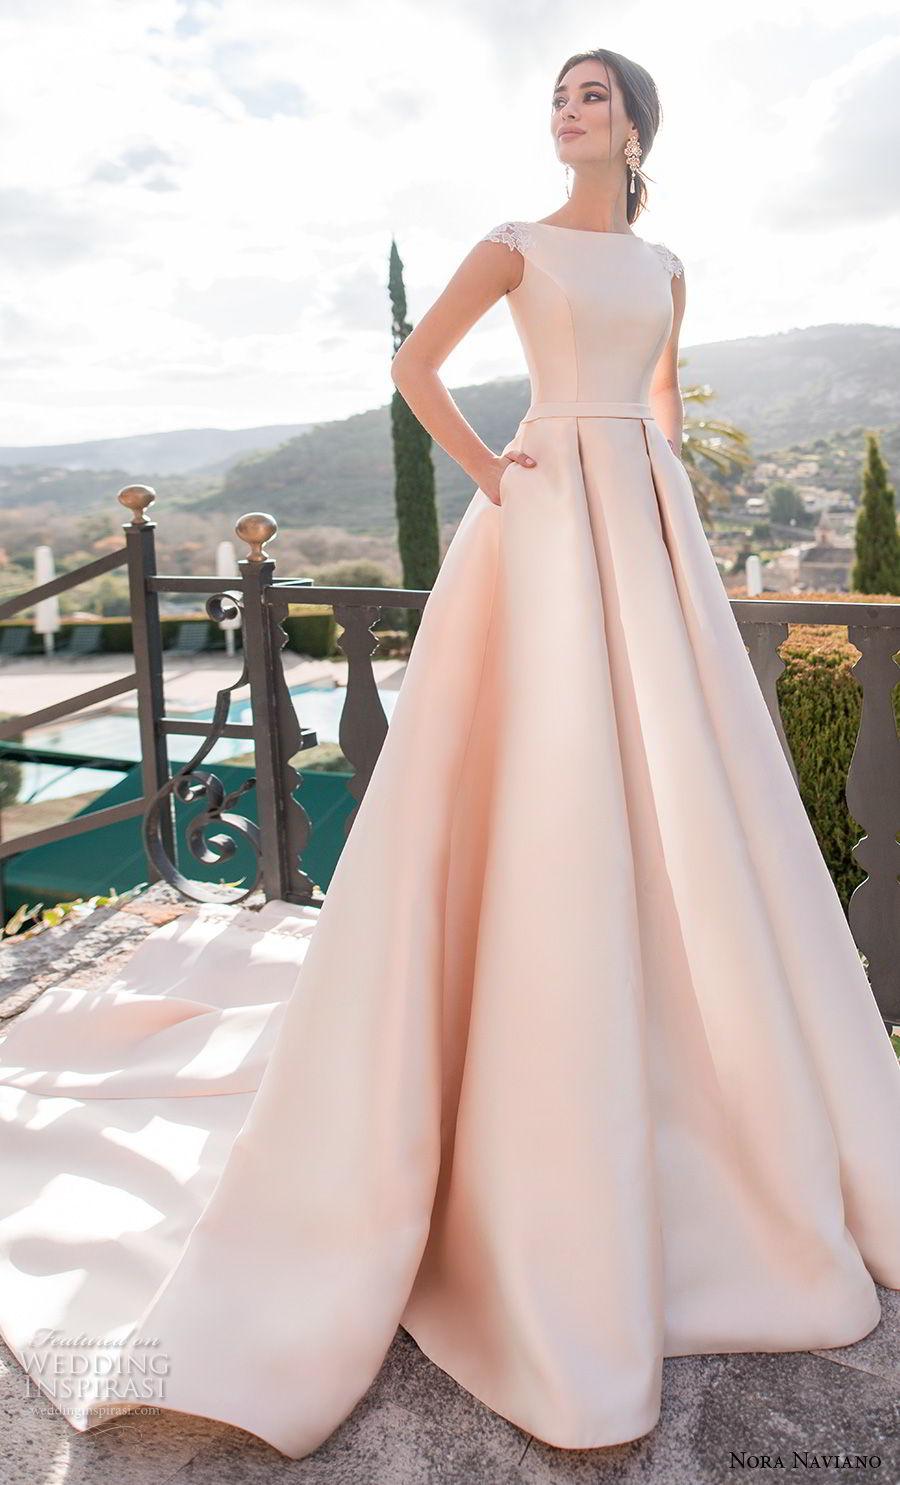 c89d6c911afe nora naviano 2019 bridal cap sleeves bateau neckline simple clean  minimalist elegant blush a line wedding